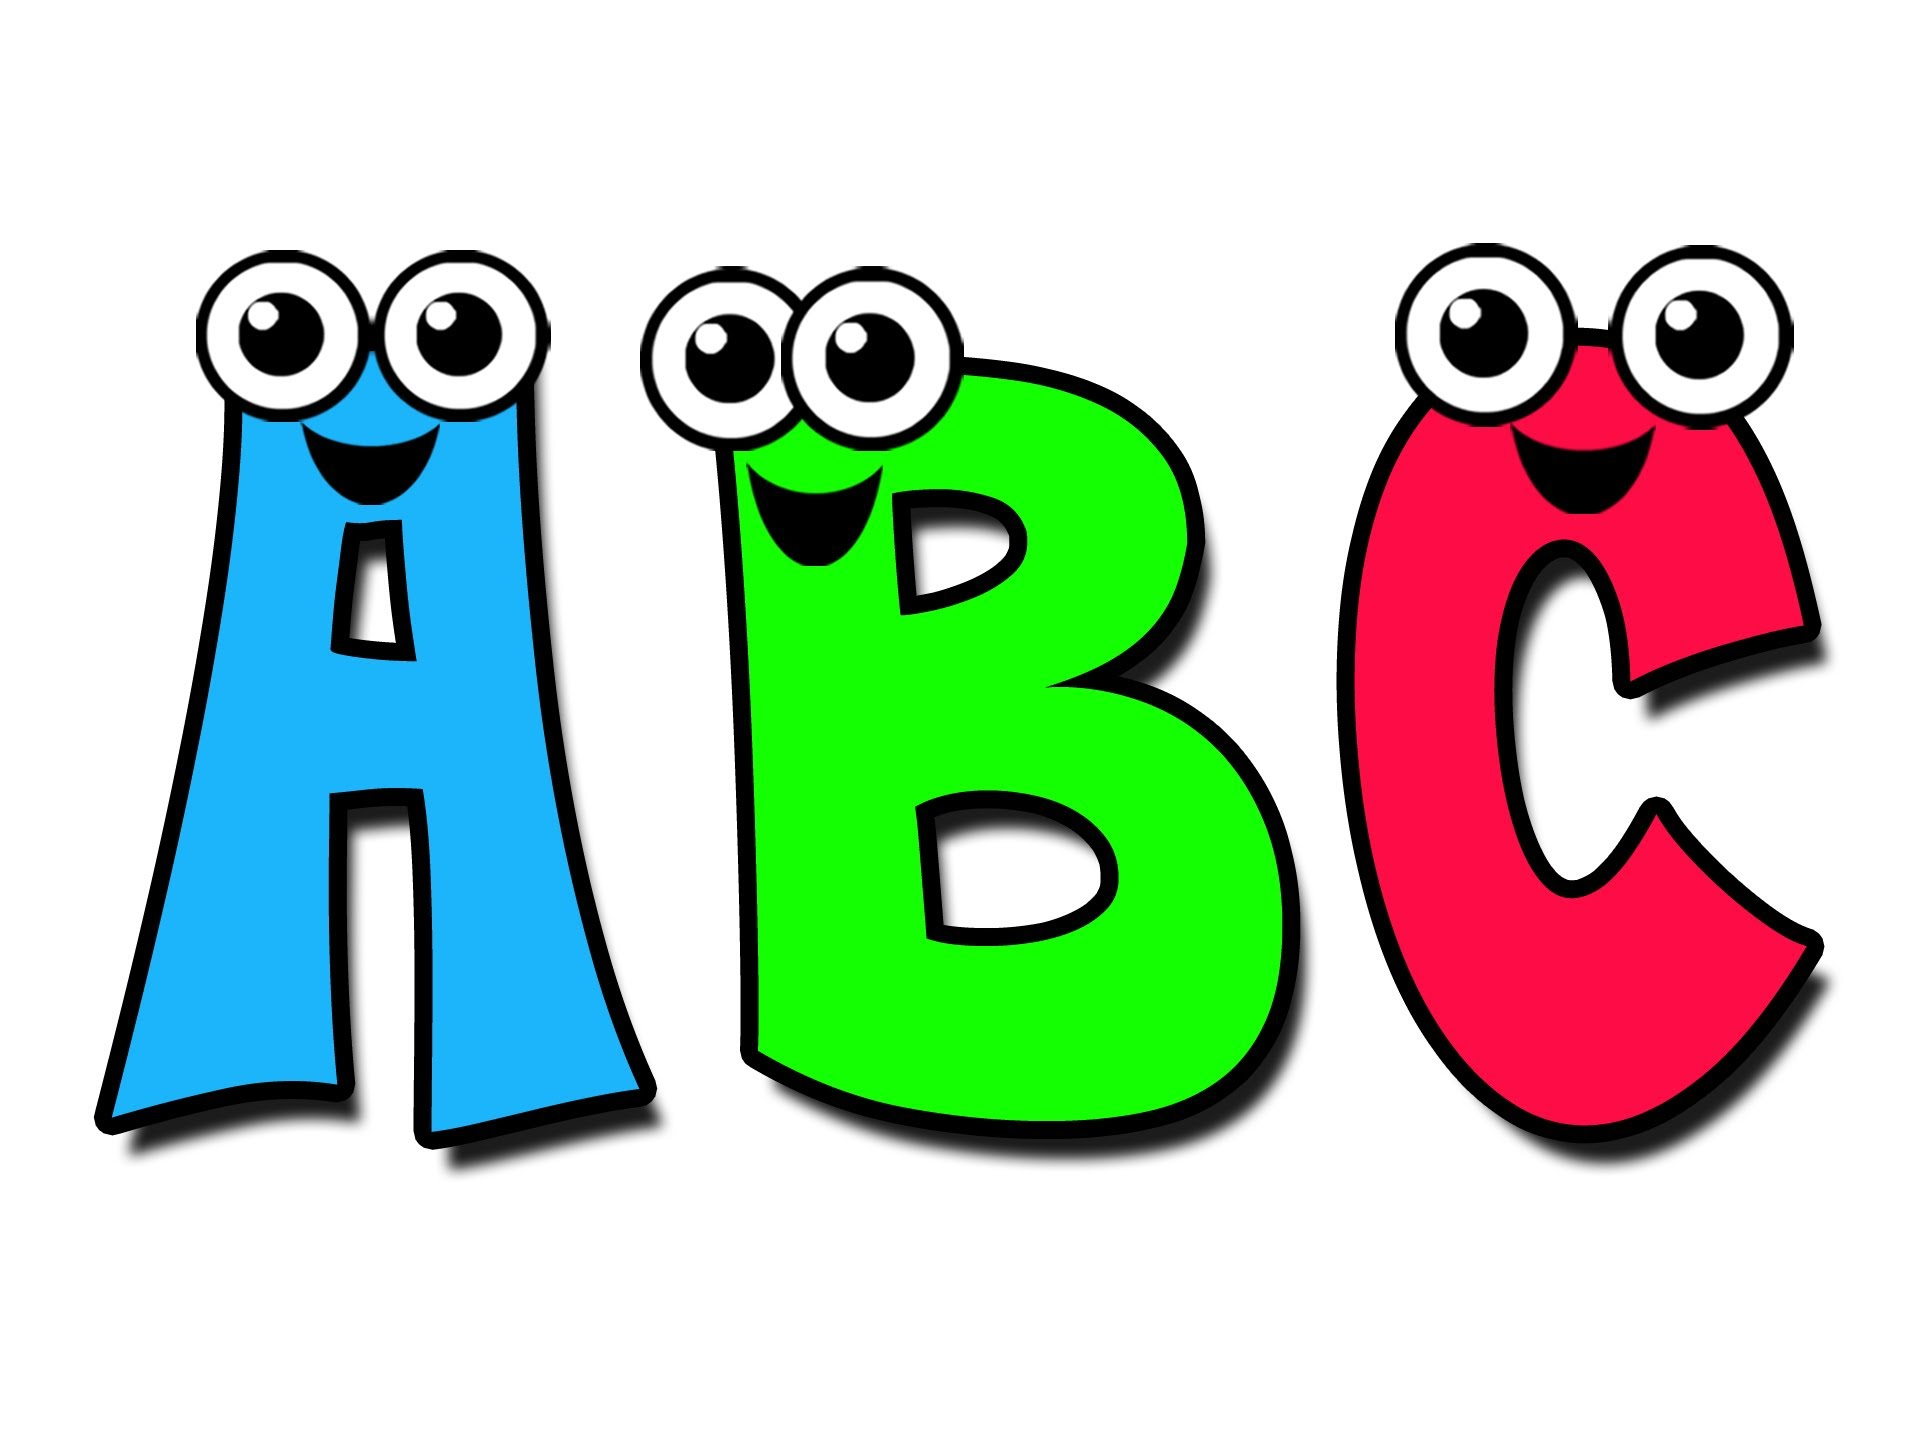 Abc songs collection vol. Centers clipart alphabet